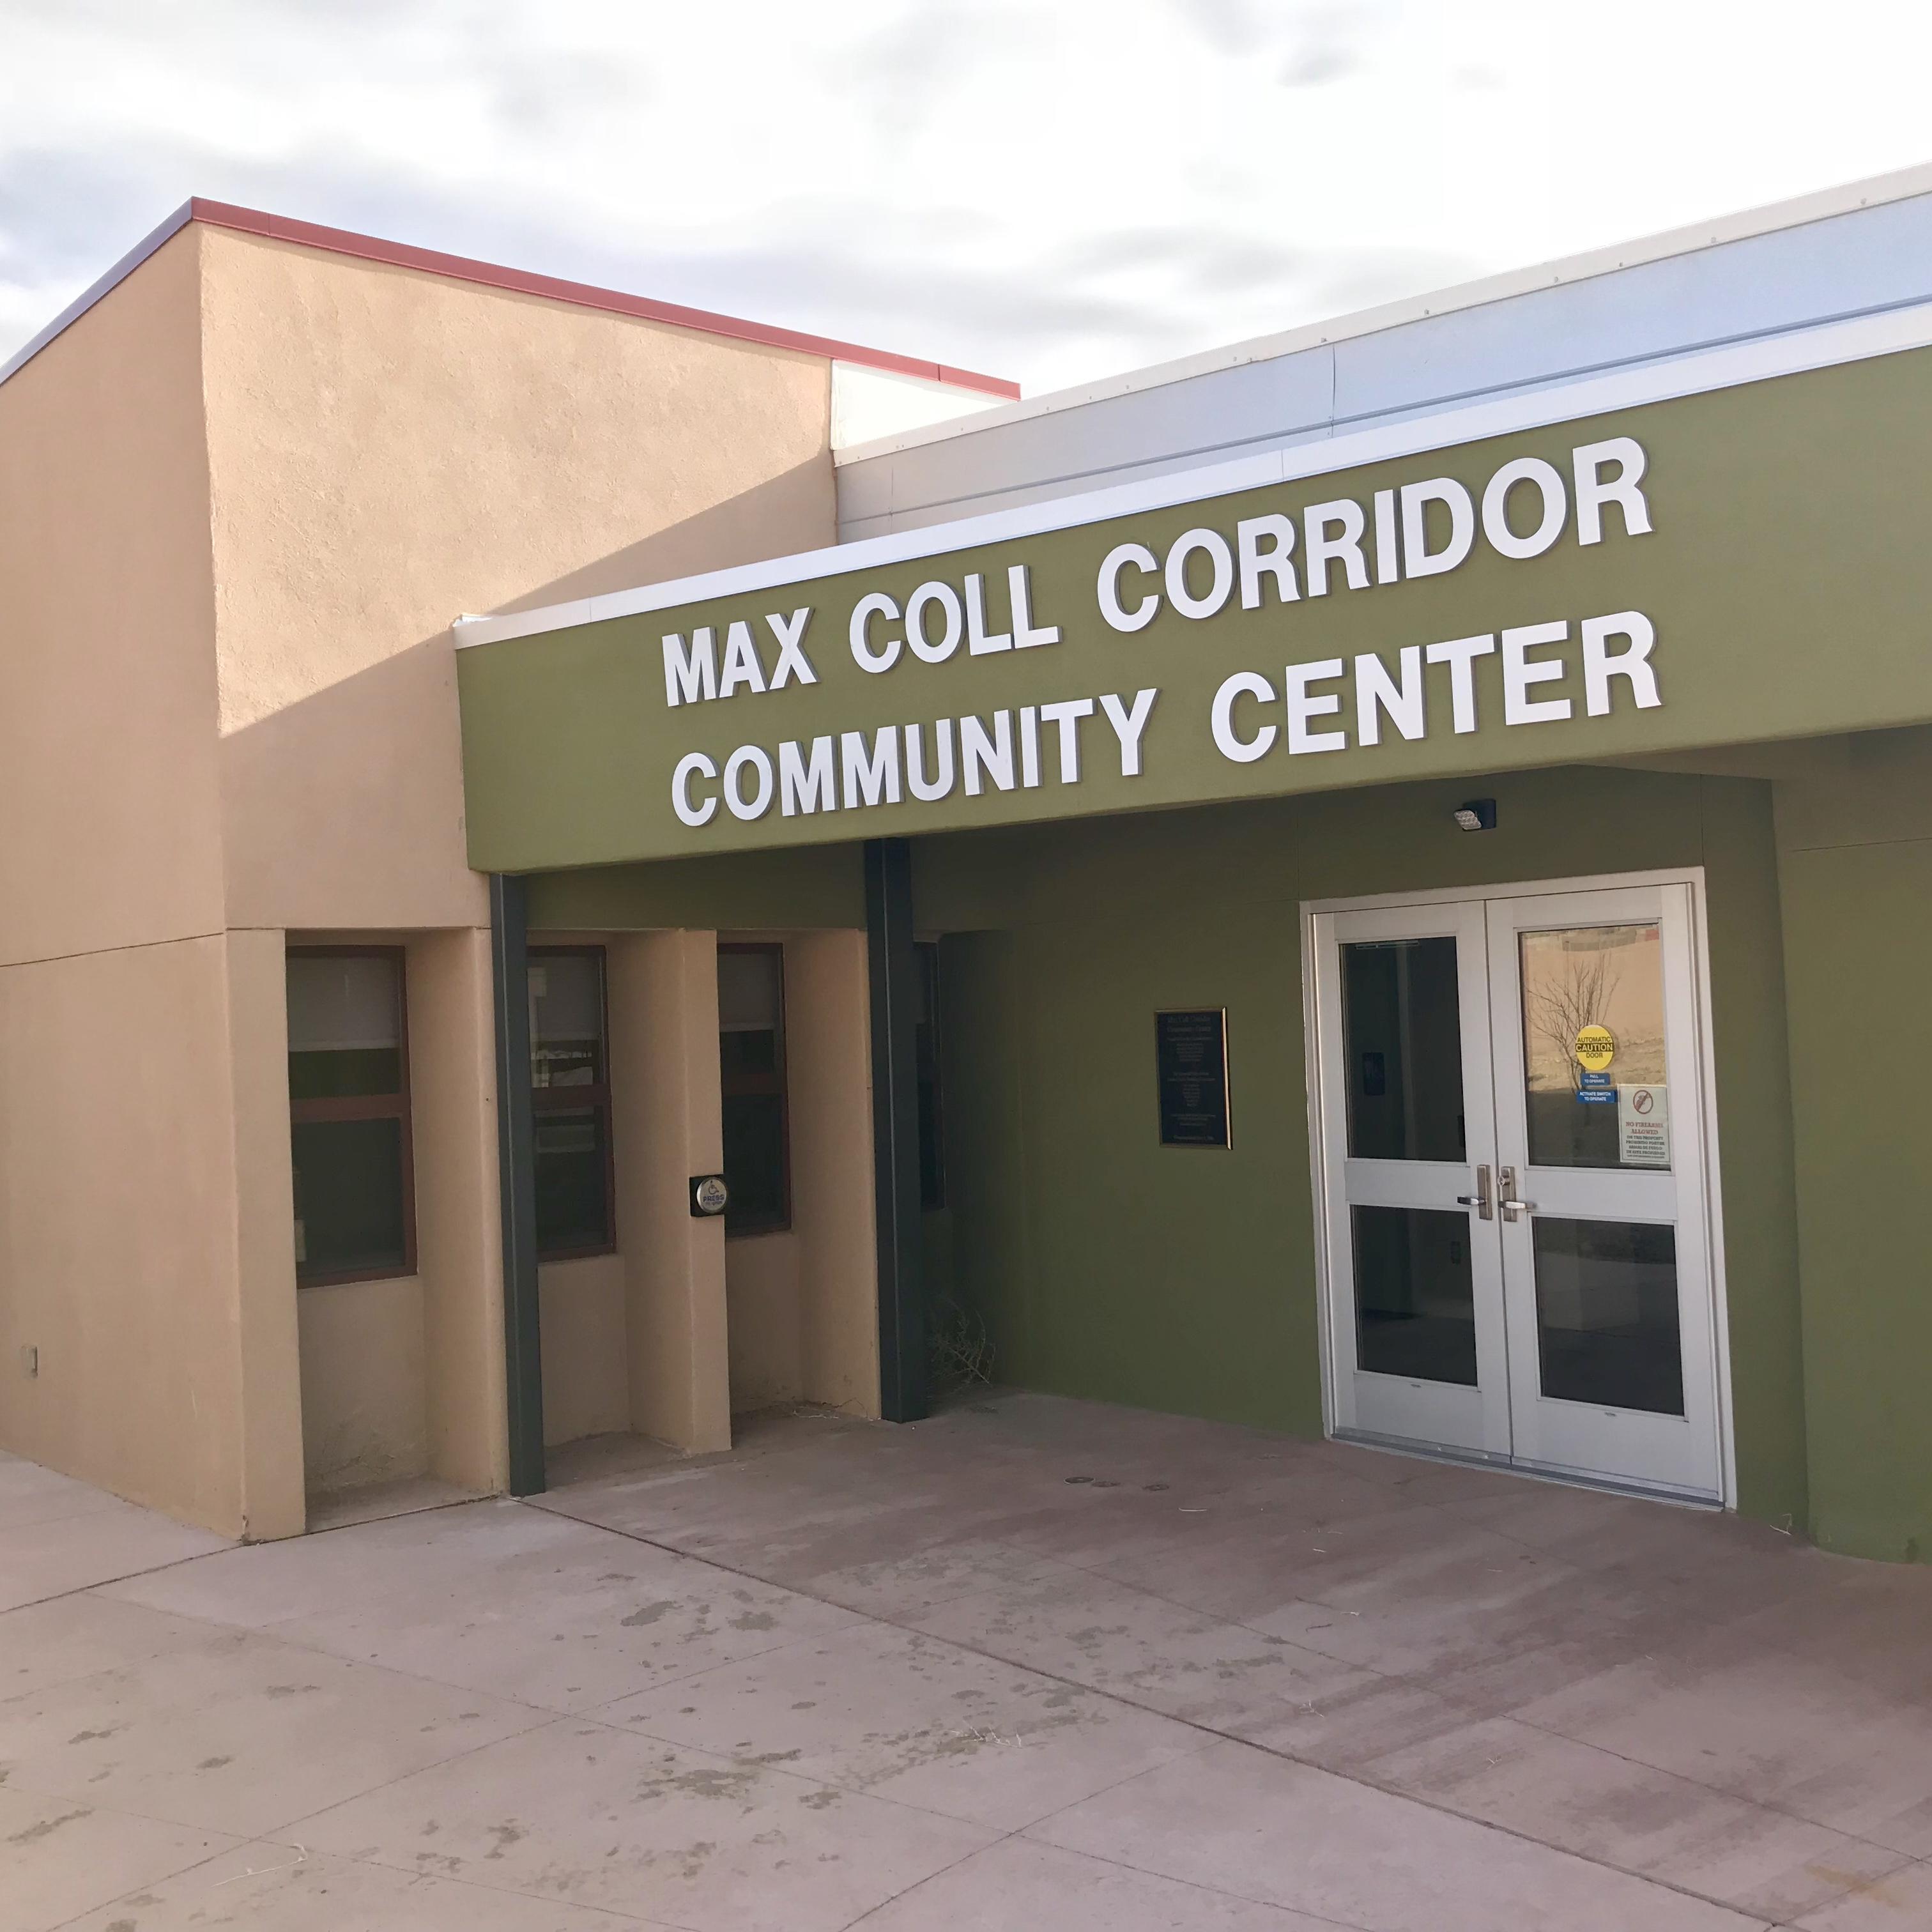 Max Coll Community Center Entrance